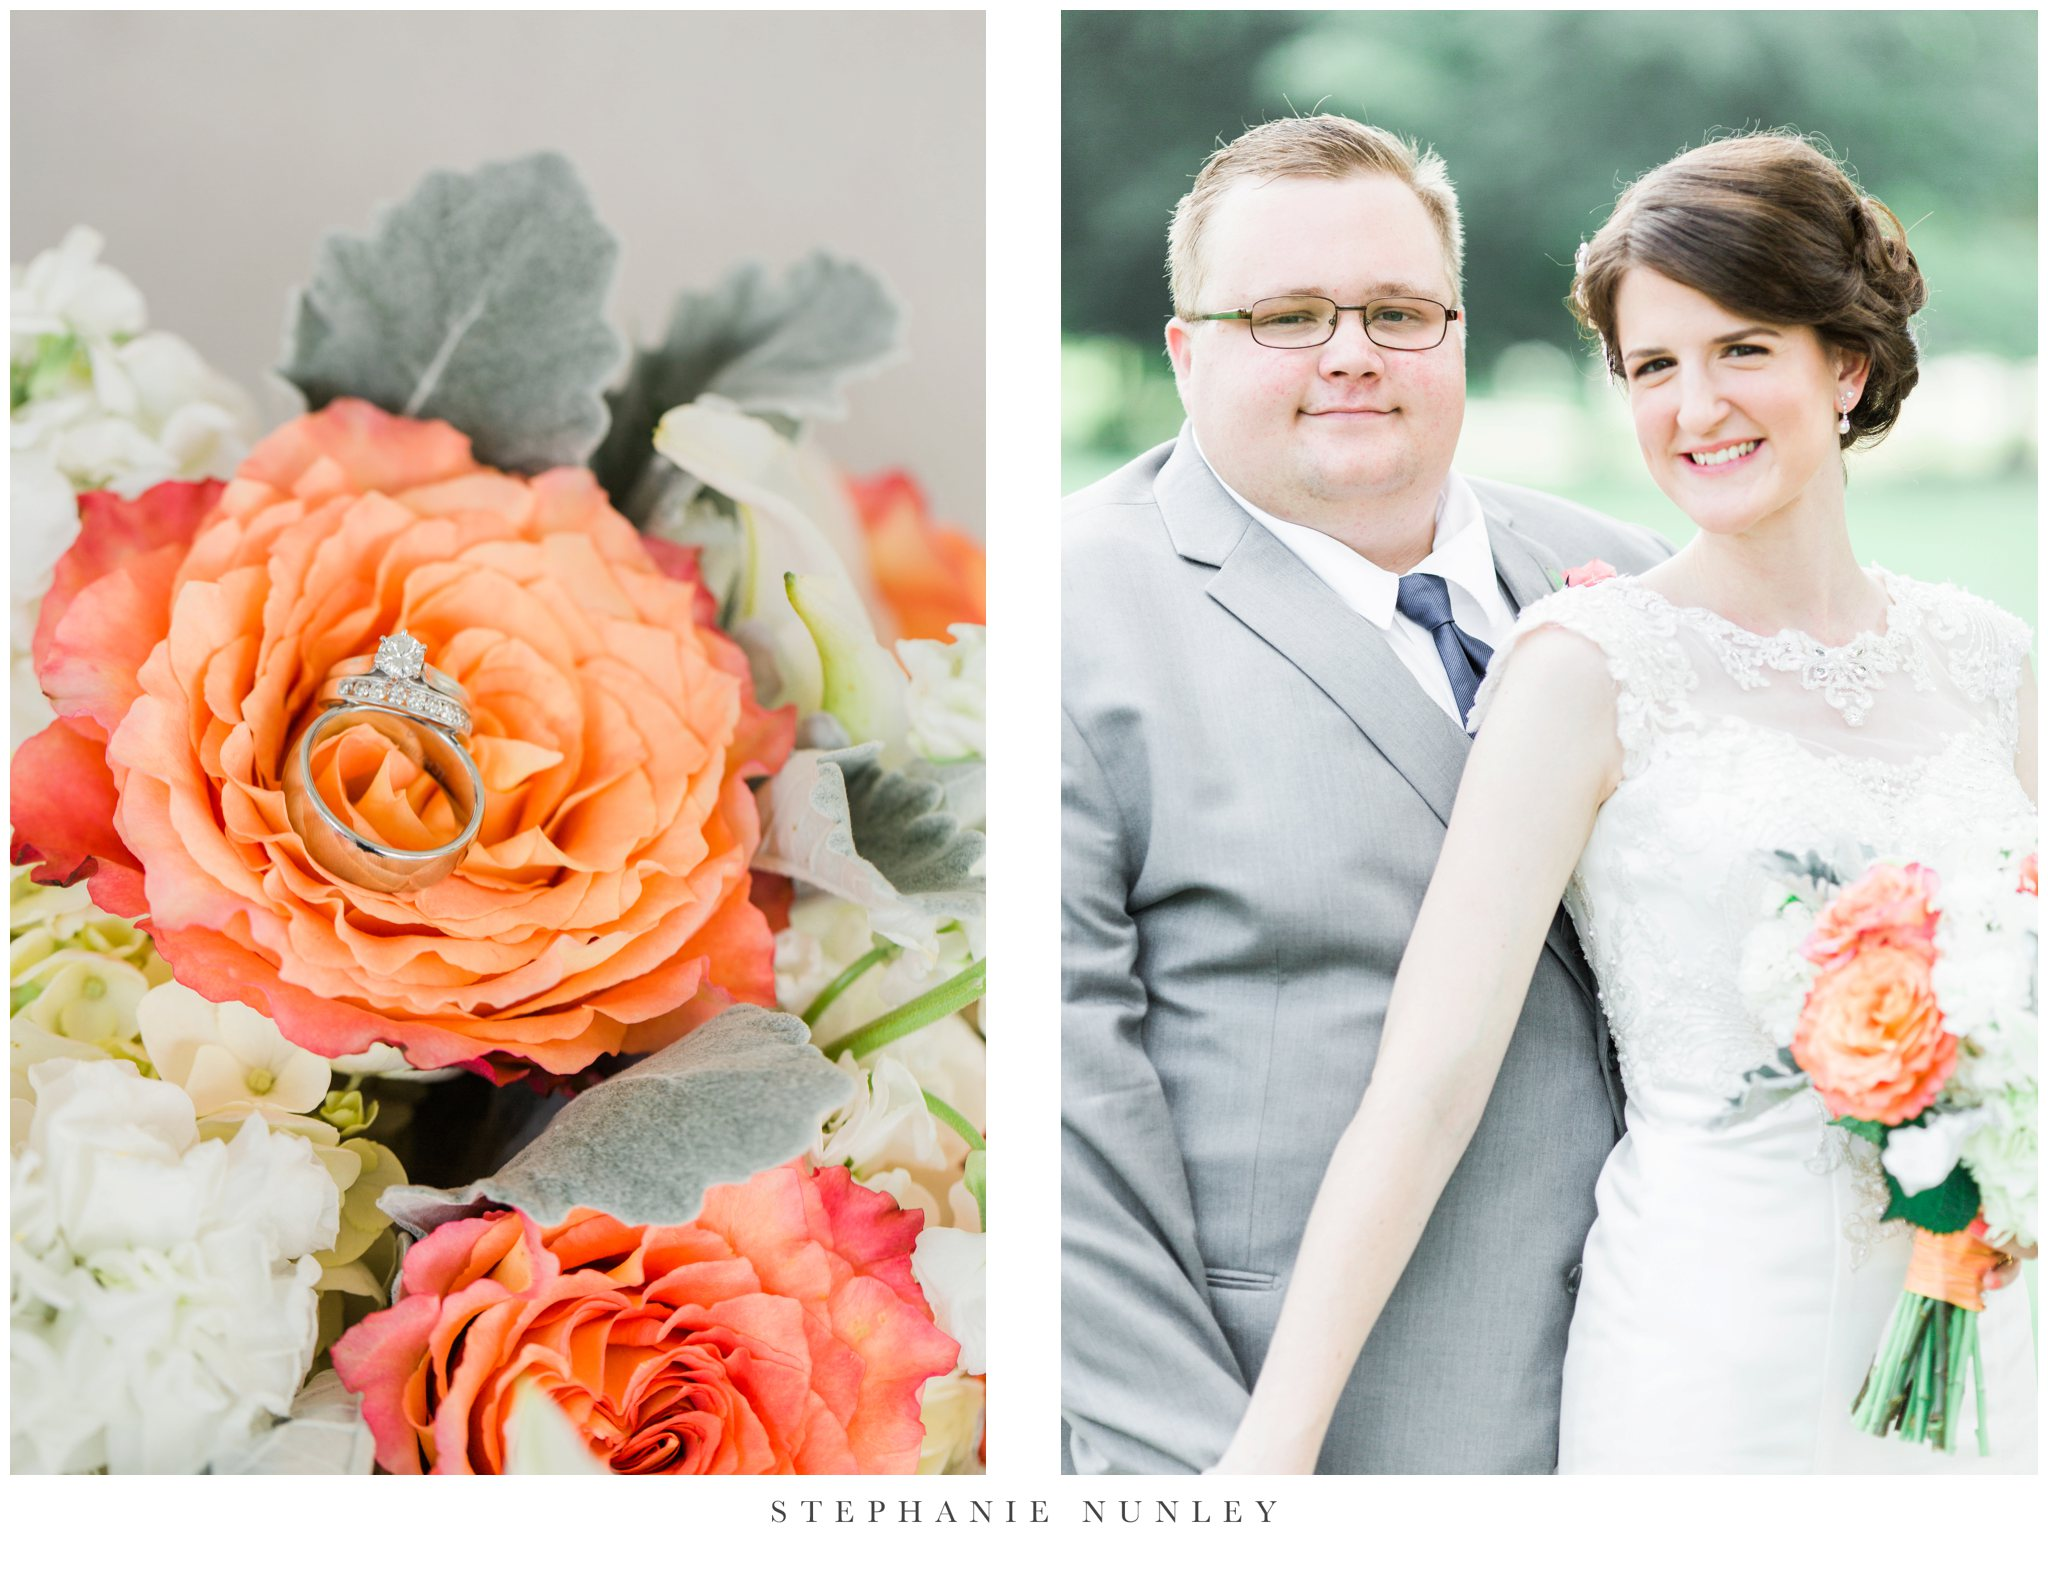 next-level-events-wedding-photos-in-little-rock-0002.jpg